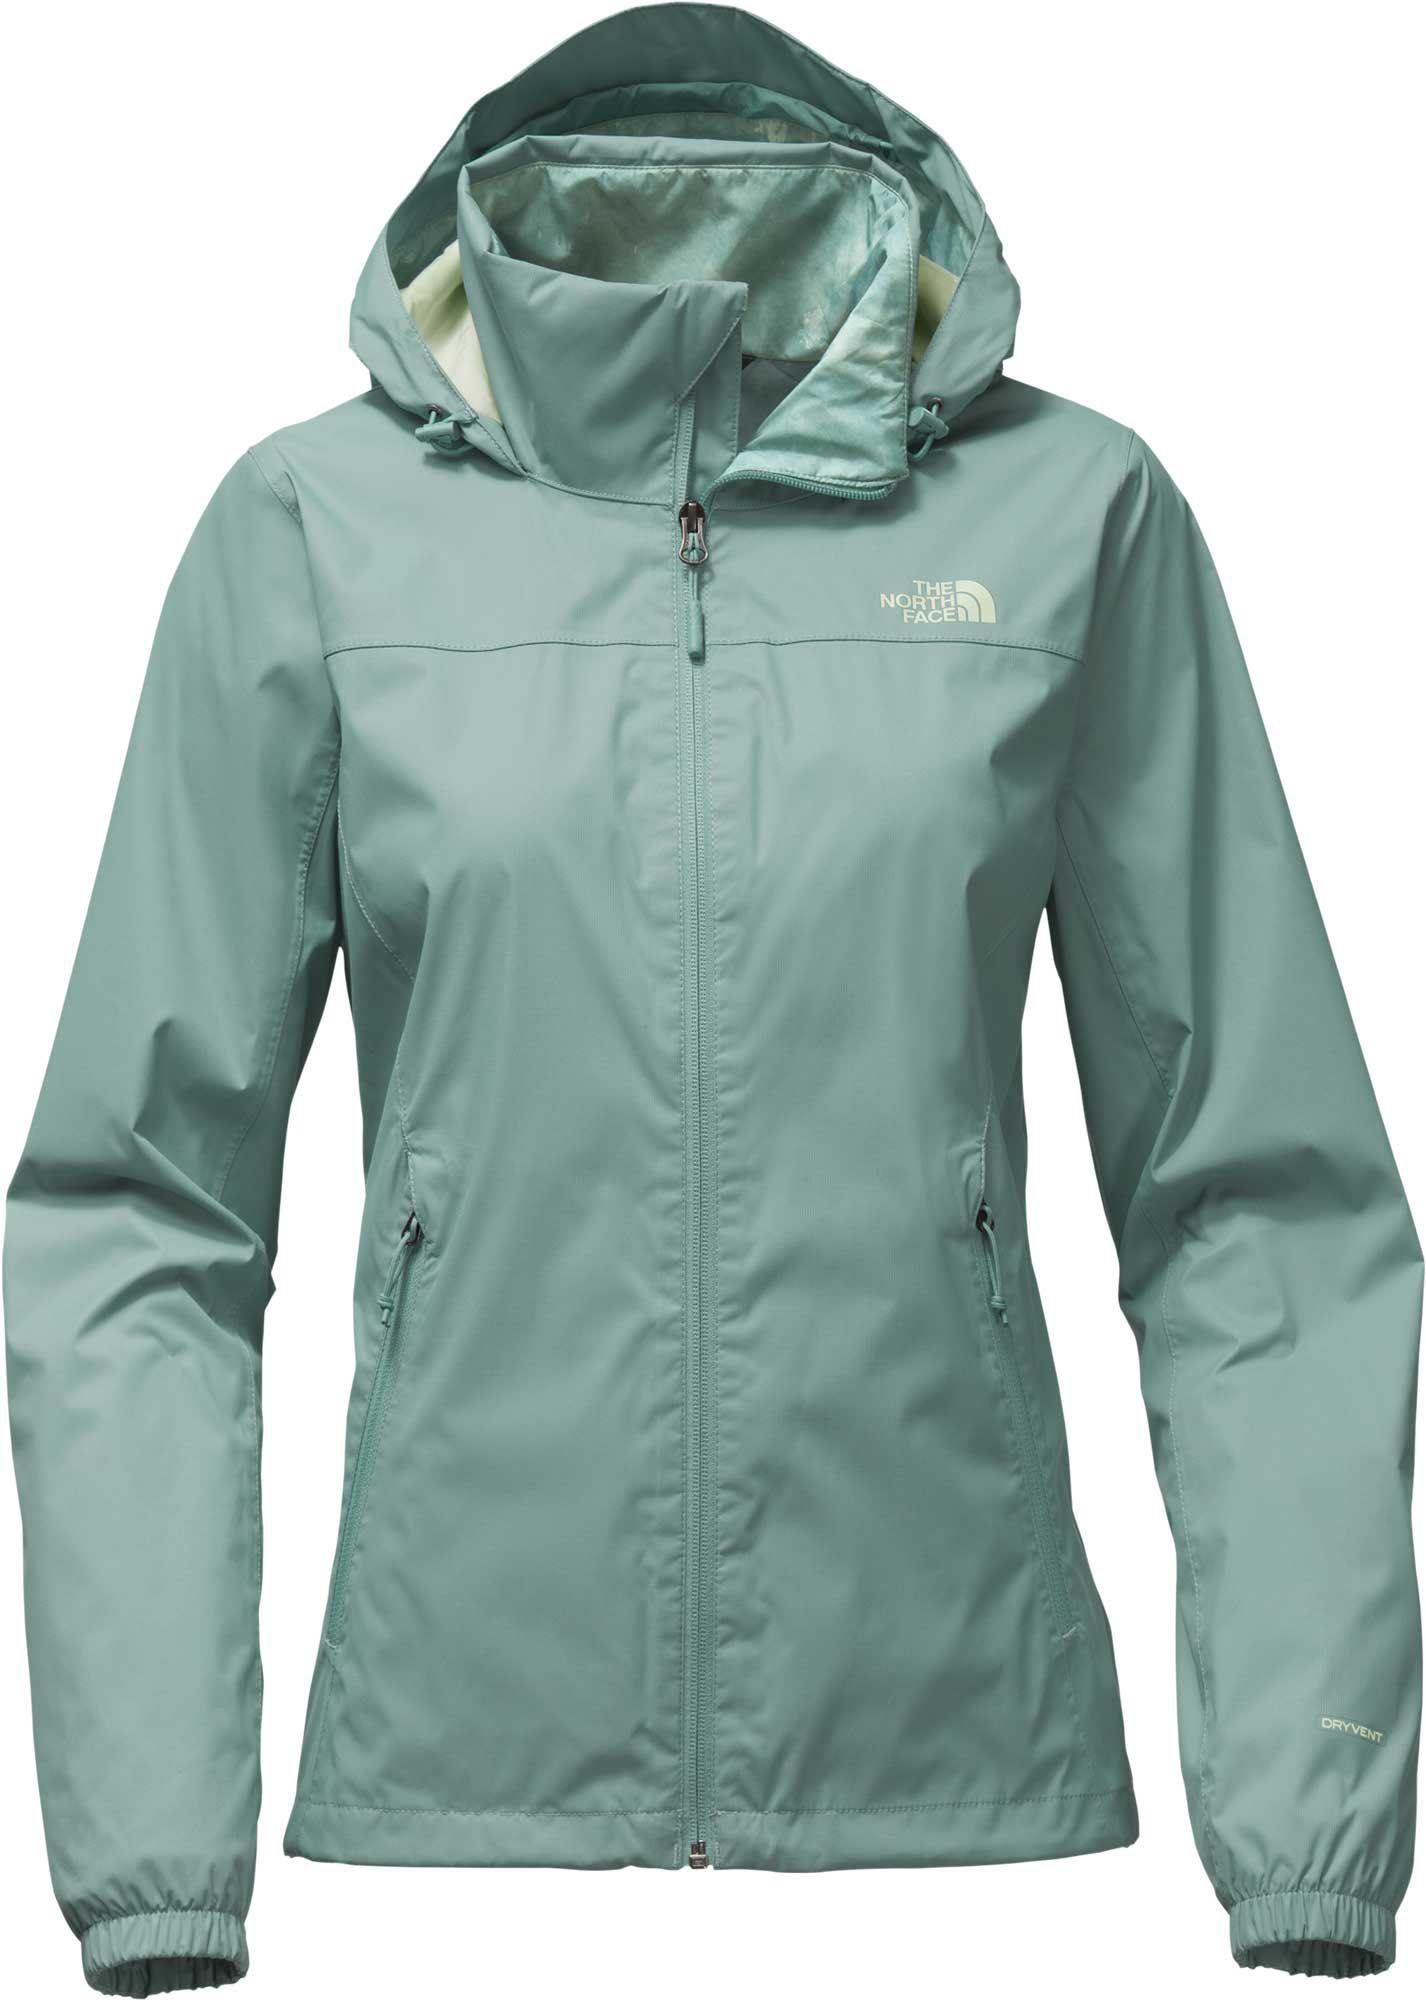 noImageFound ??? - The North Face Women's Resolve Rain Jacket DICK'S Sporting Goods